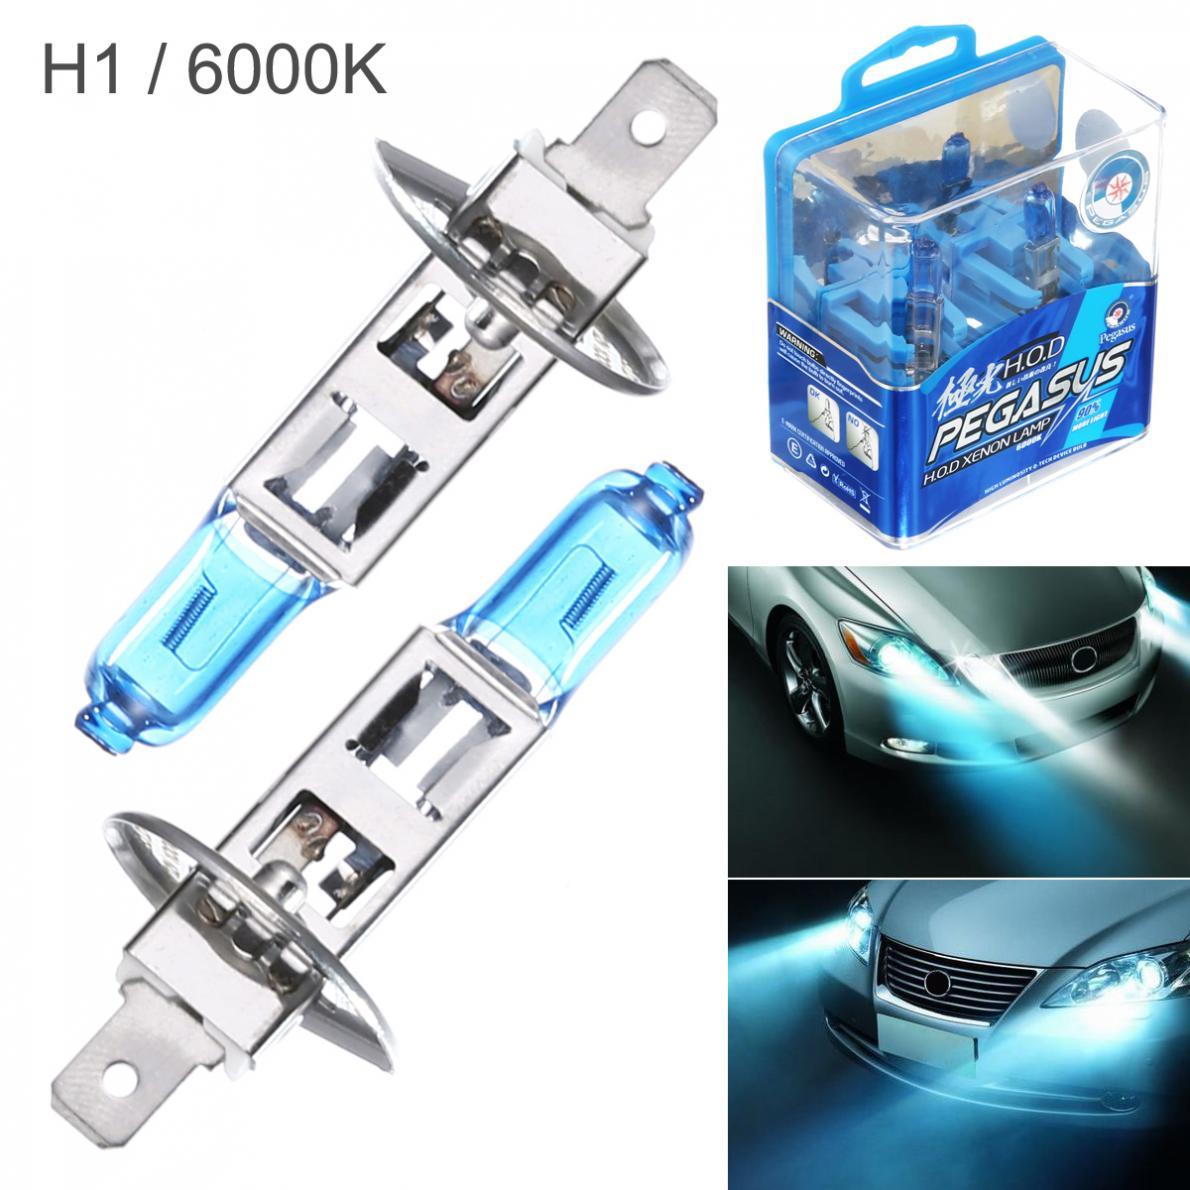 2Pcs/Lot H1 H3 H4 9005 100W White Light Super Bright Car HOD Xenon Halogen Lamp Auto Front Headlight Fog Bulb